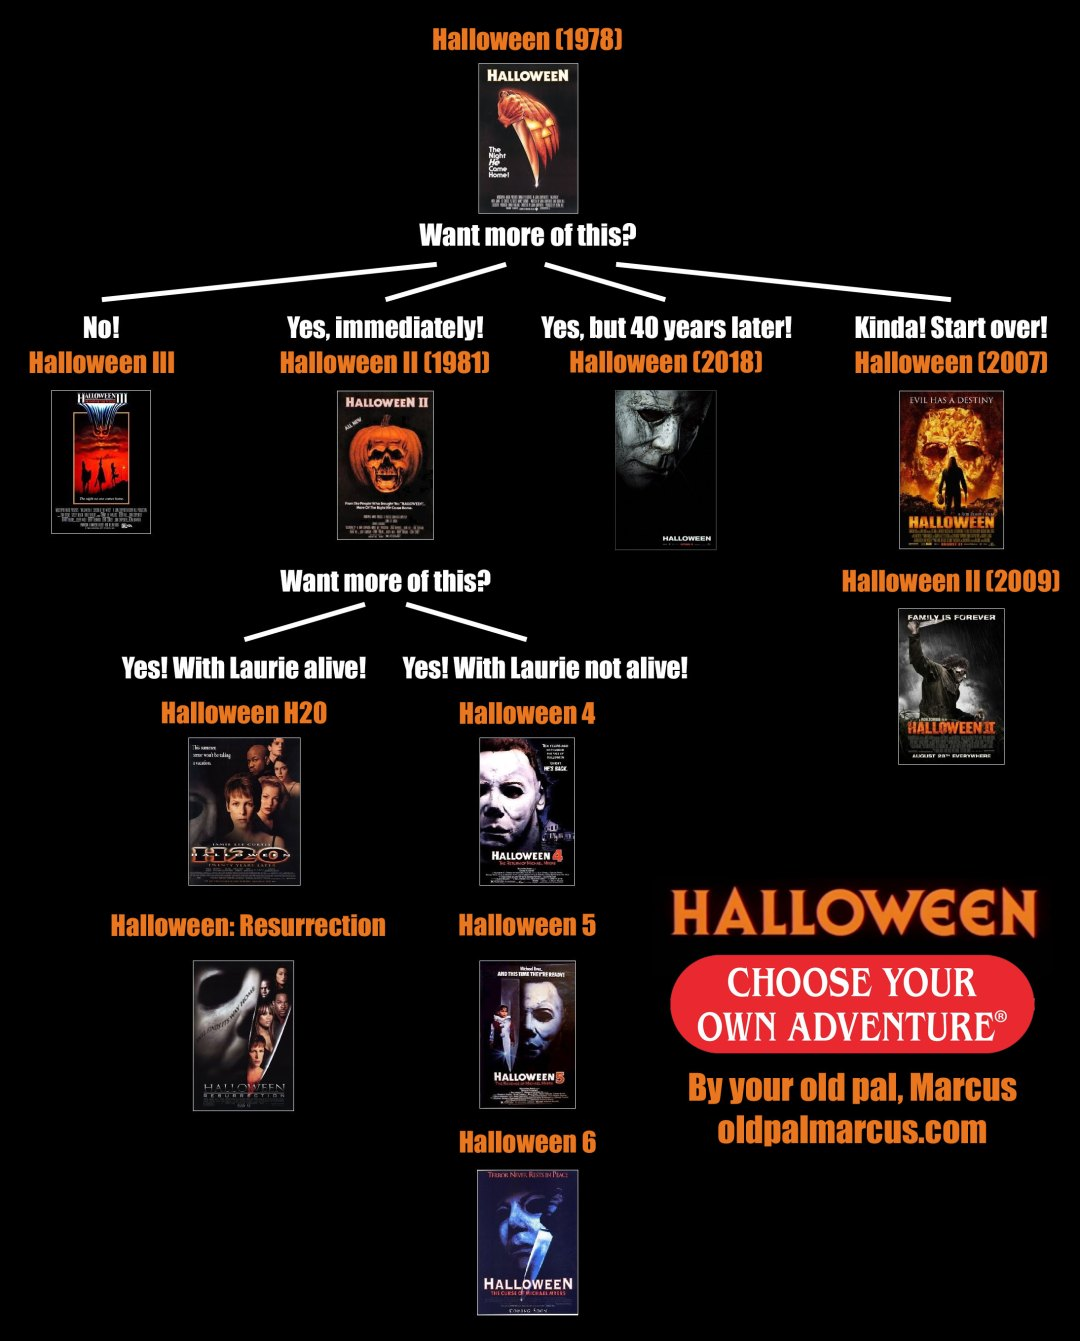 Halloween Choose Your Own Adventure